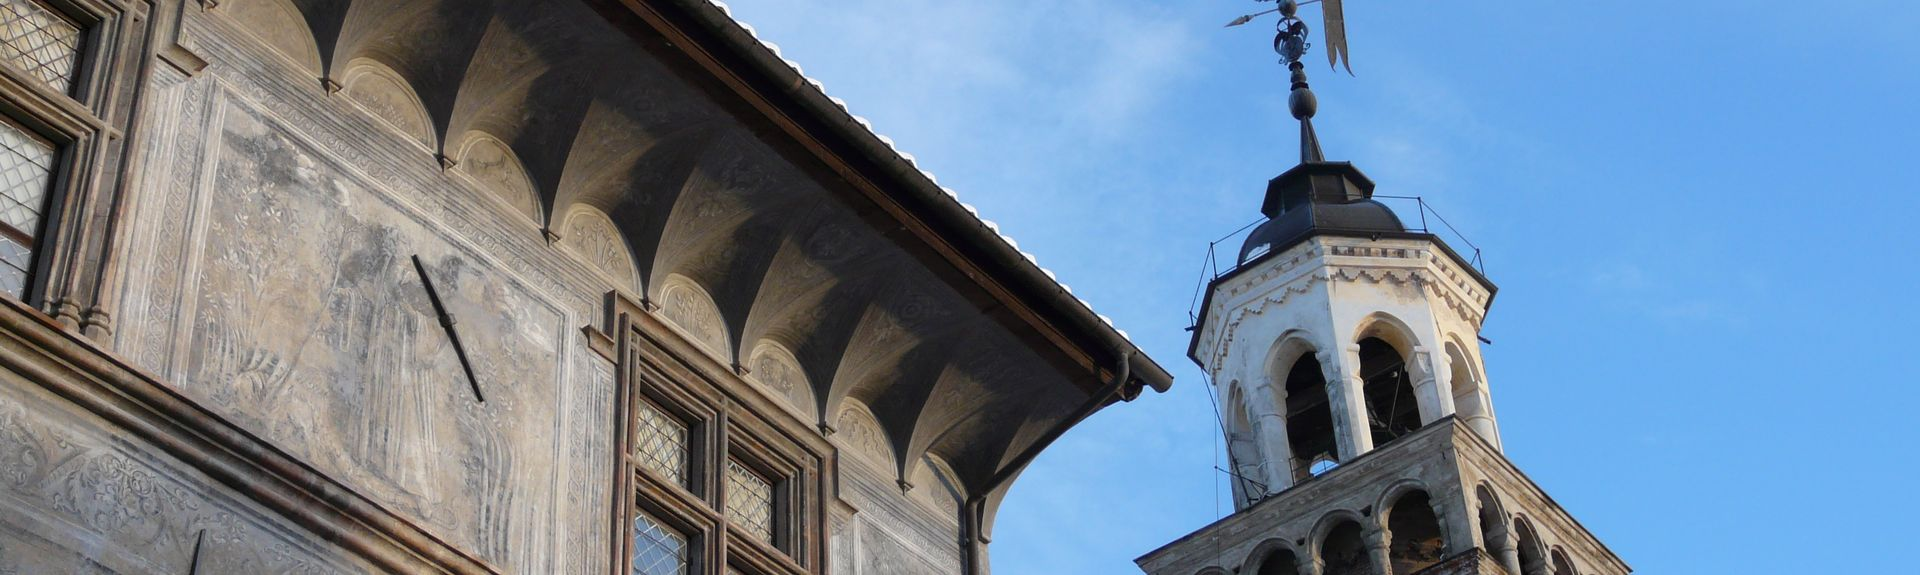 Saluzzo, Piemonte, Itália